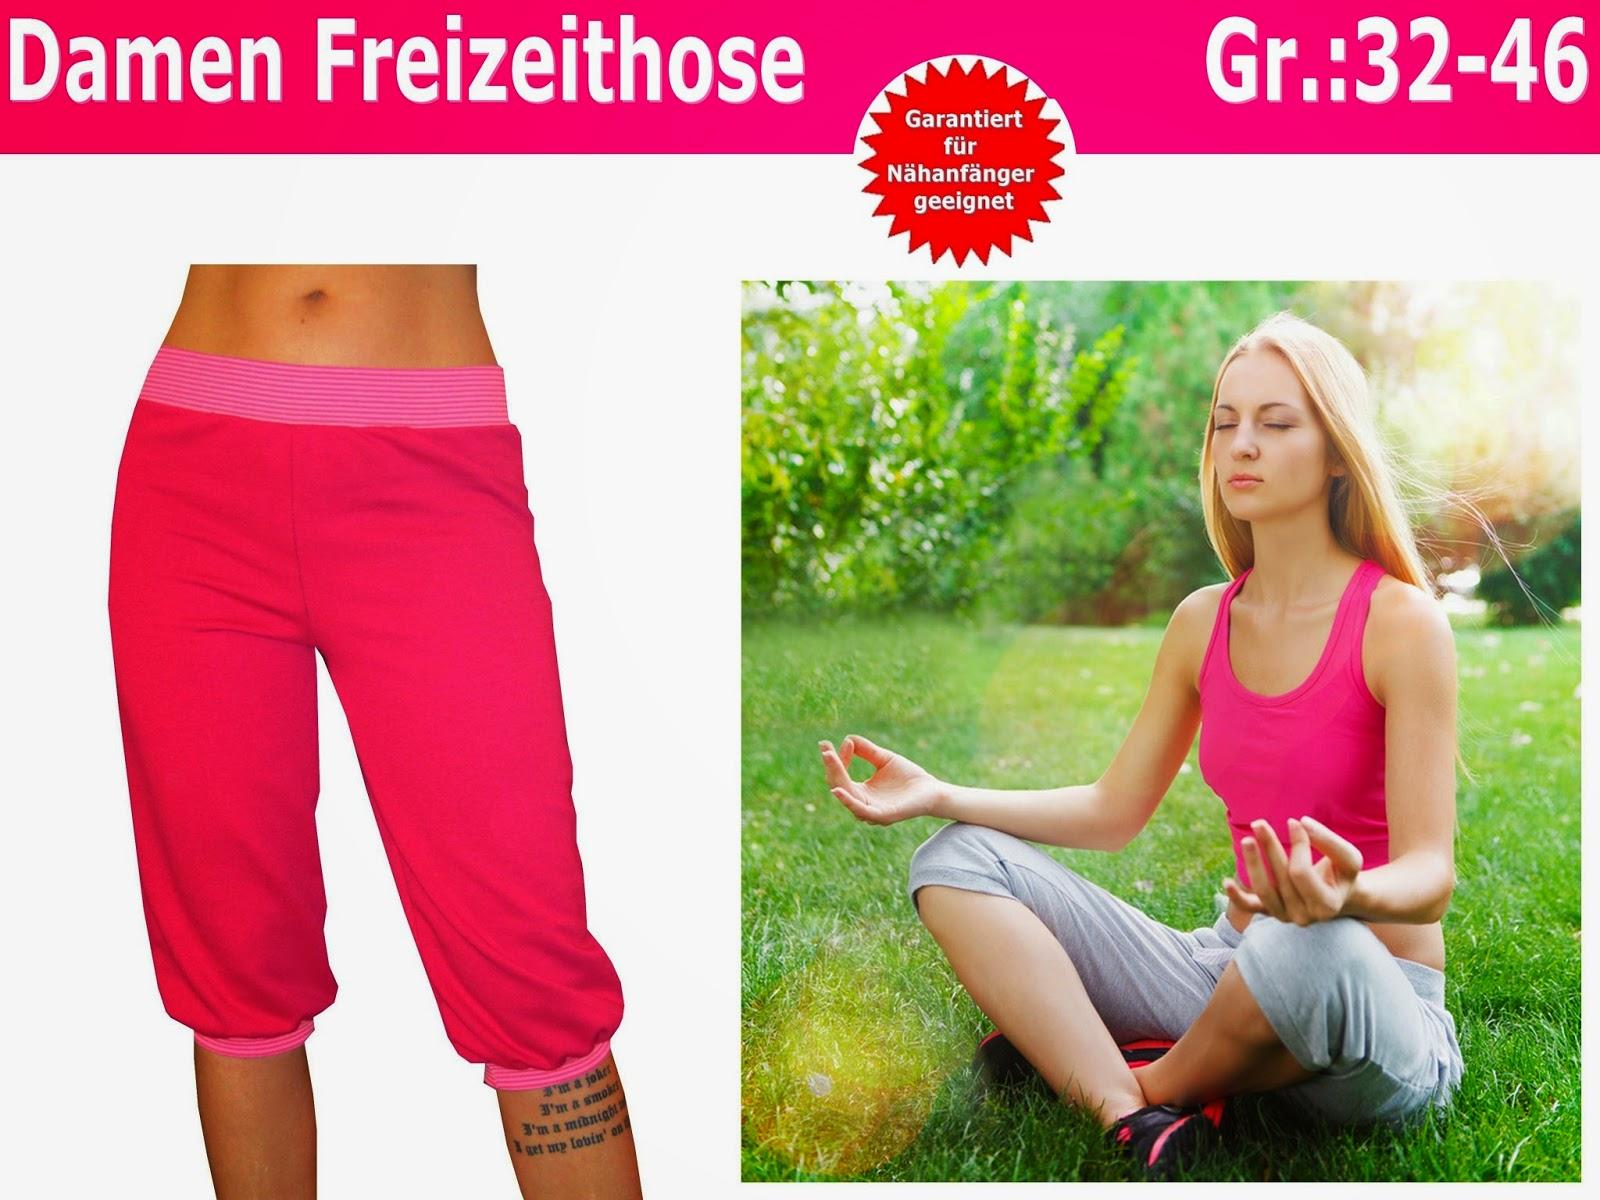 Trash Monstarz® Nähshop : Schnittmuster Pumphose für Damen nähen